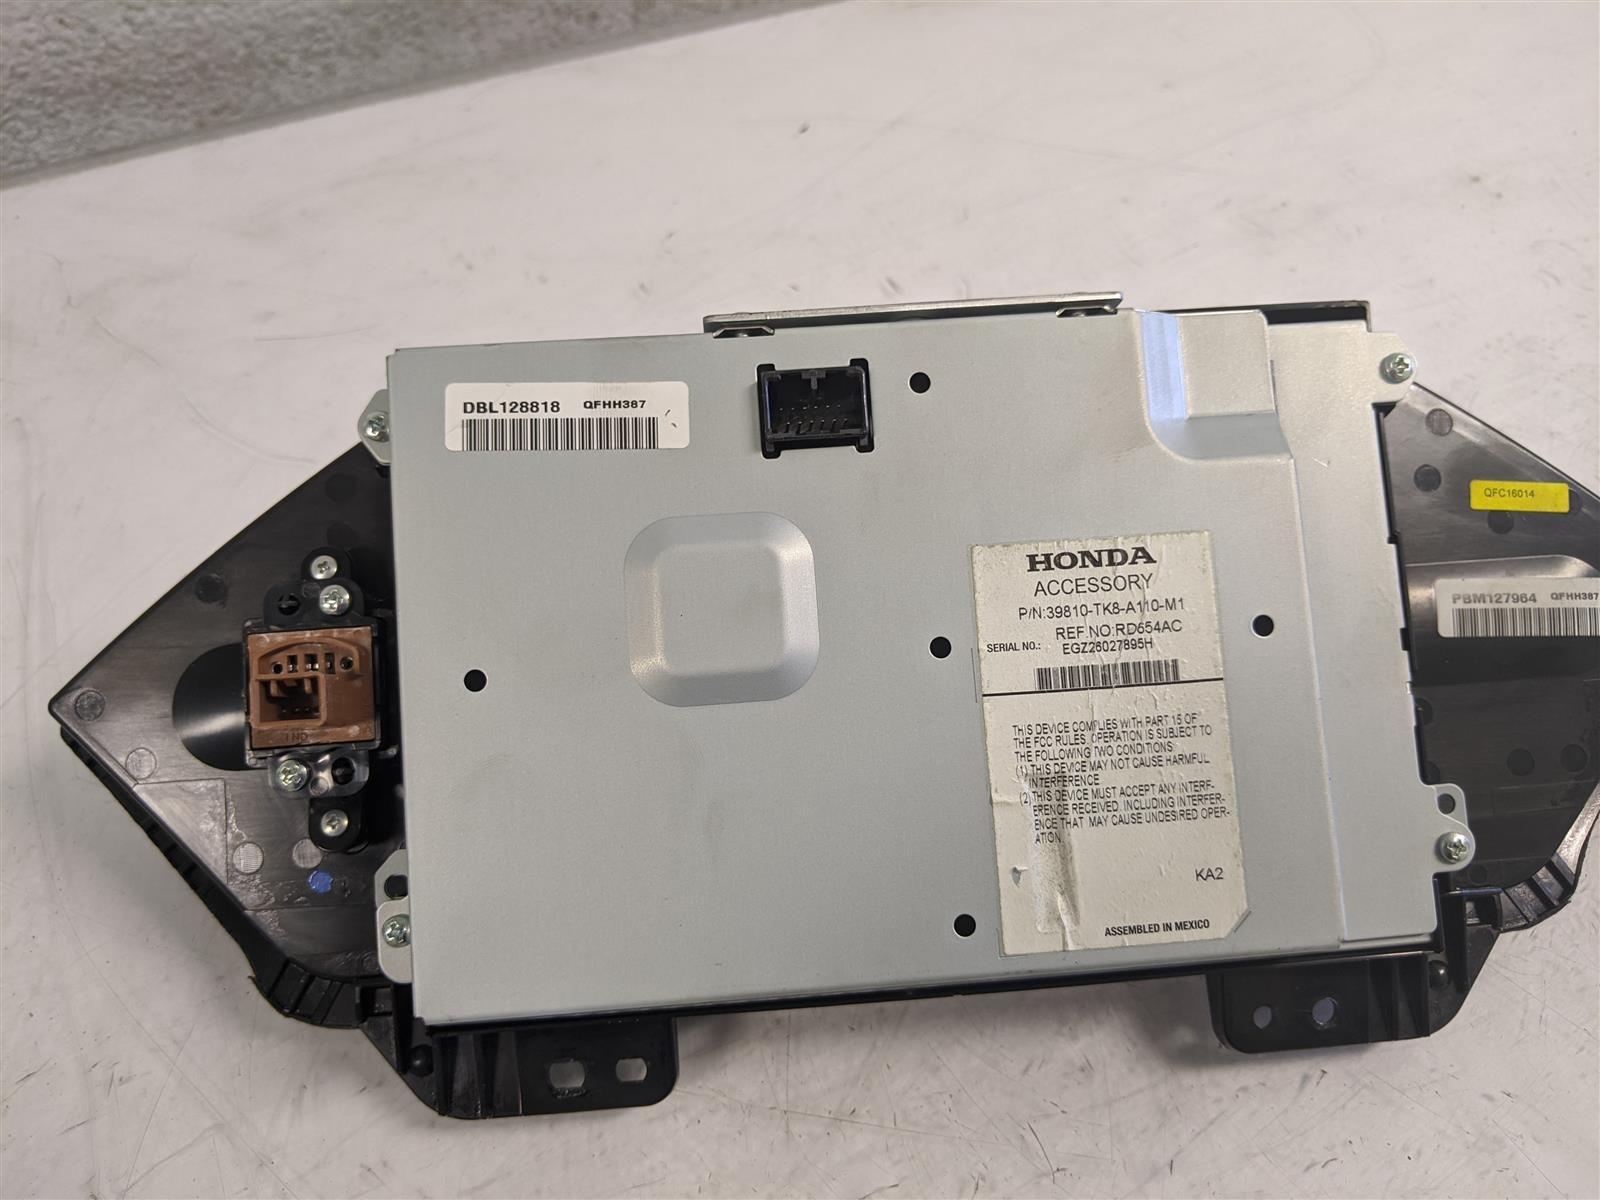 2014 Honda Odyssey Upper Display Screen Replacement